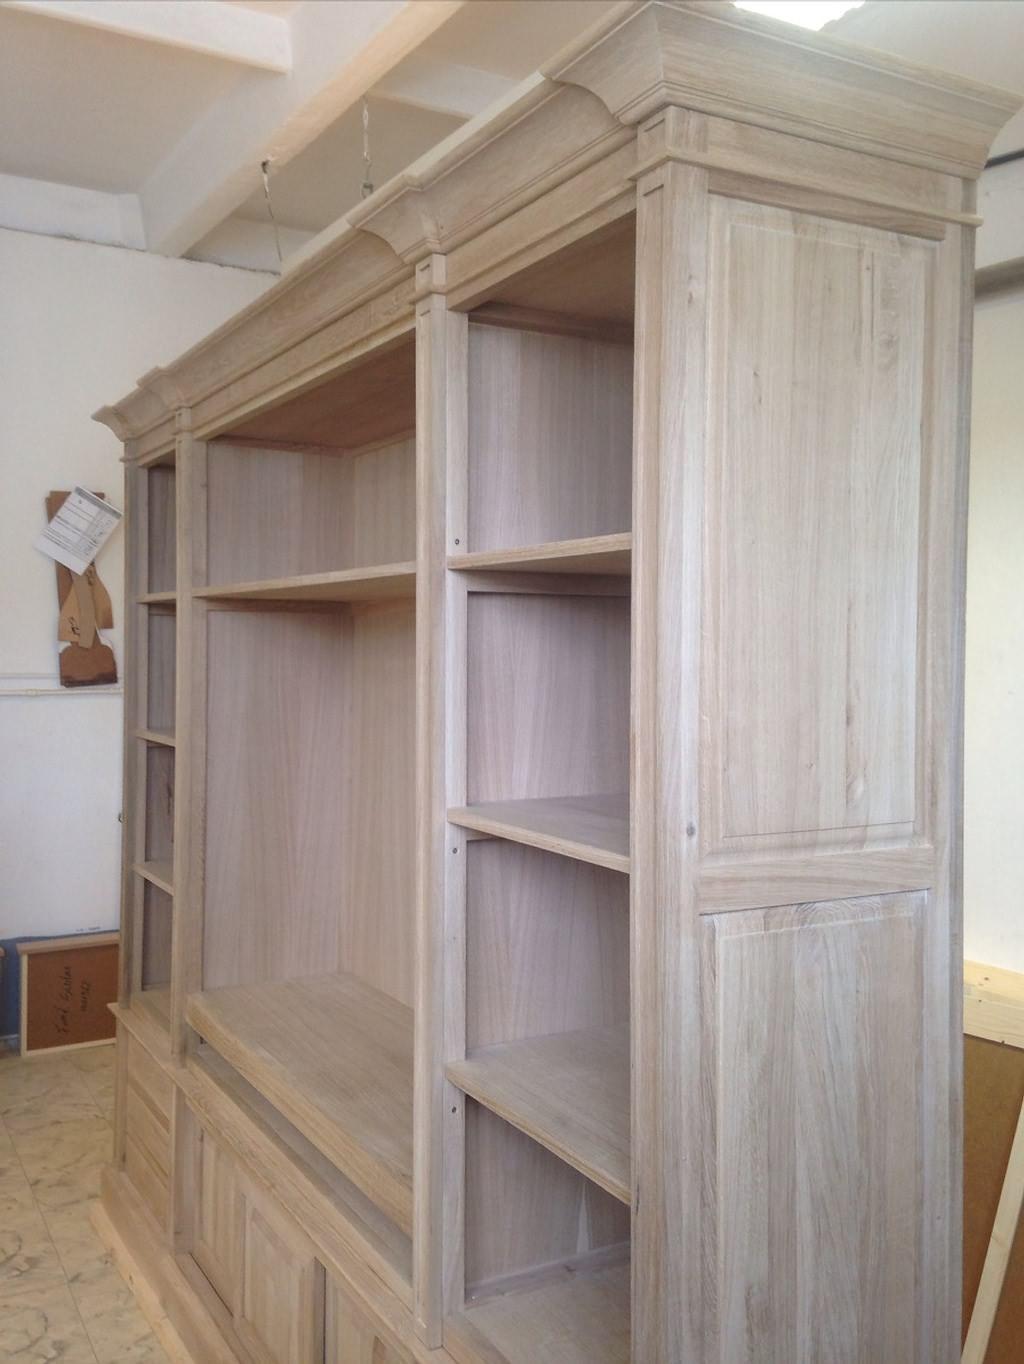 bibliothekswand castle eiche landhaus country dam 2000 ltd co kg. Black Bedroom Furniture Sets. Home Design Ideas